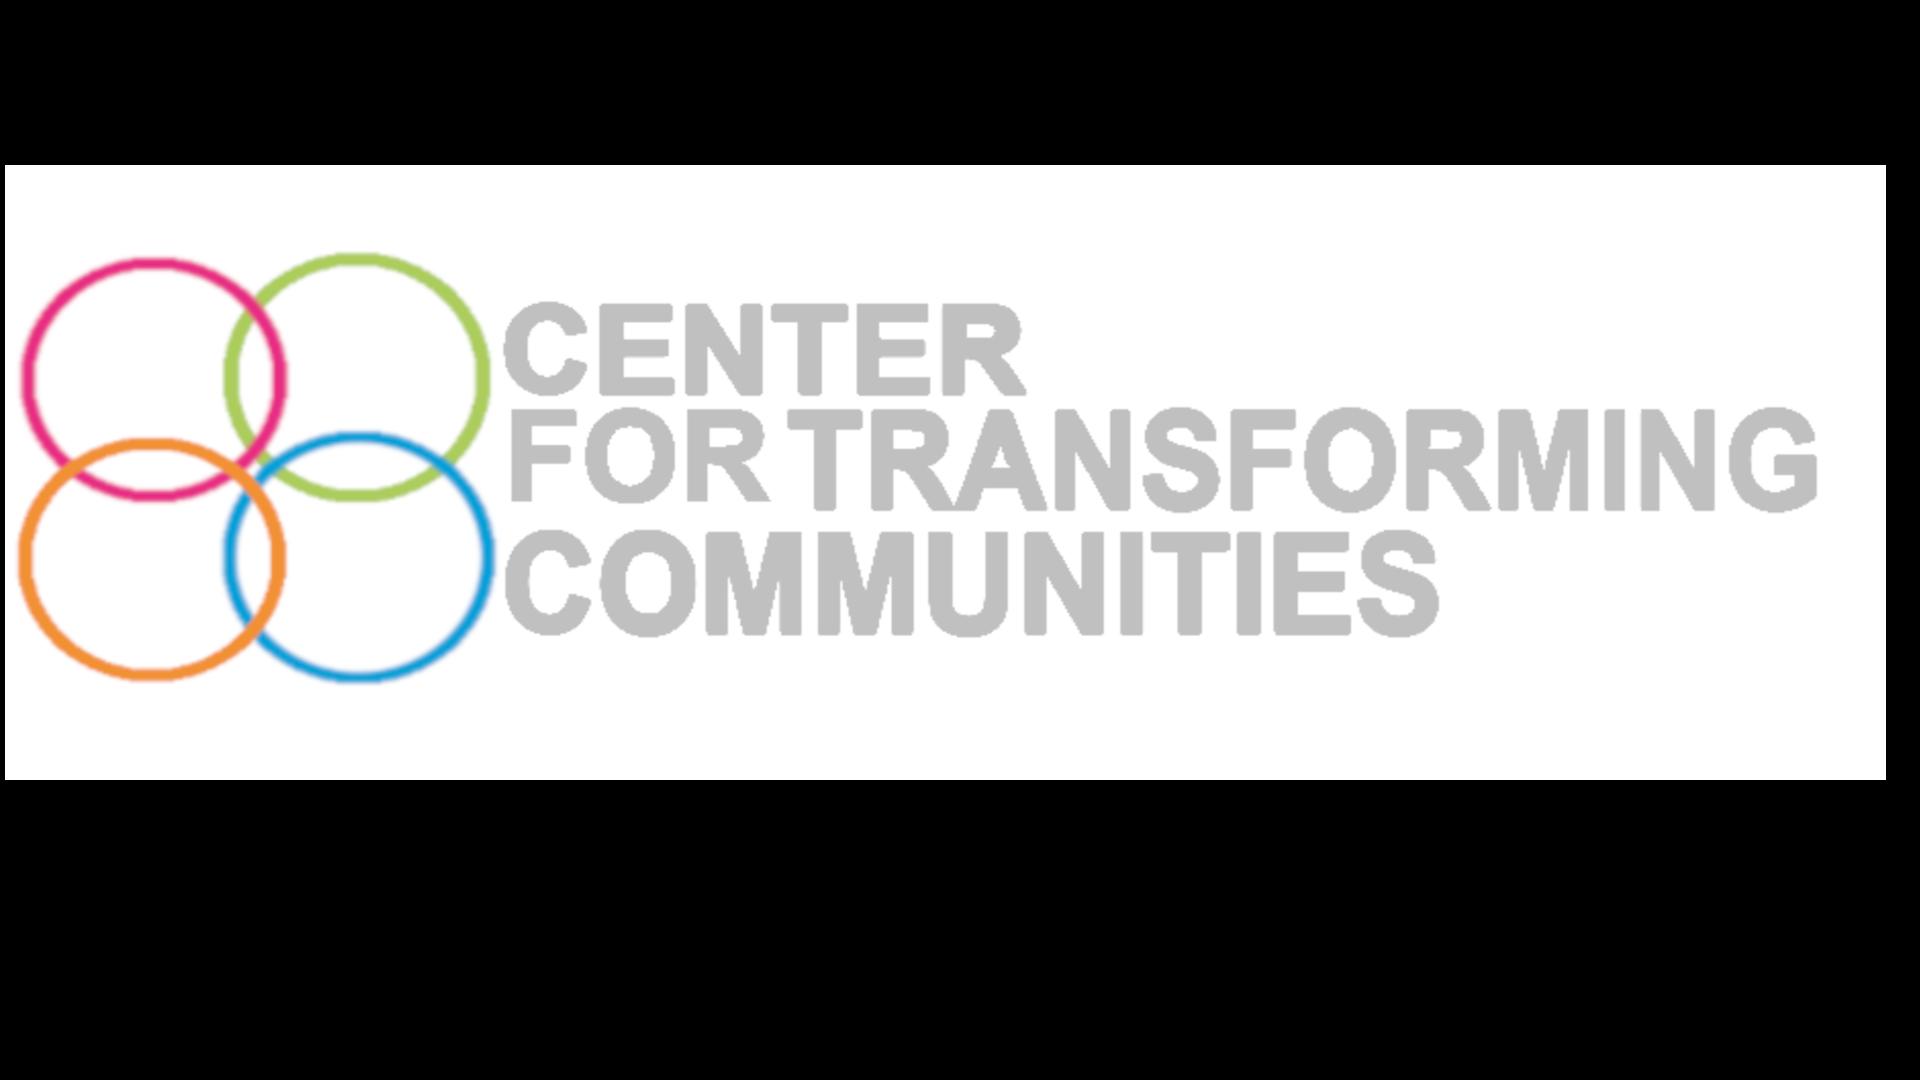 Center for Transforming Communities